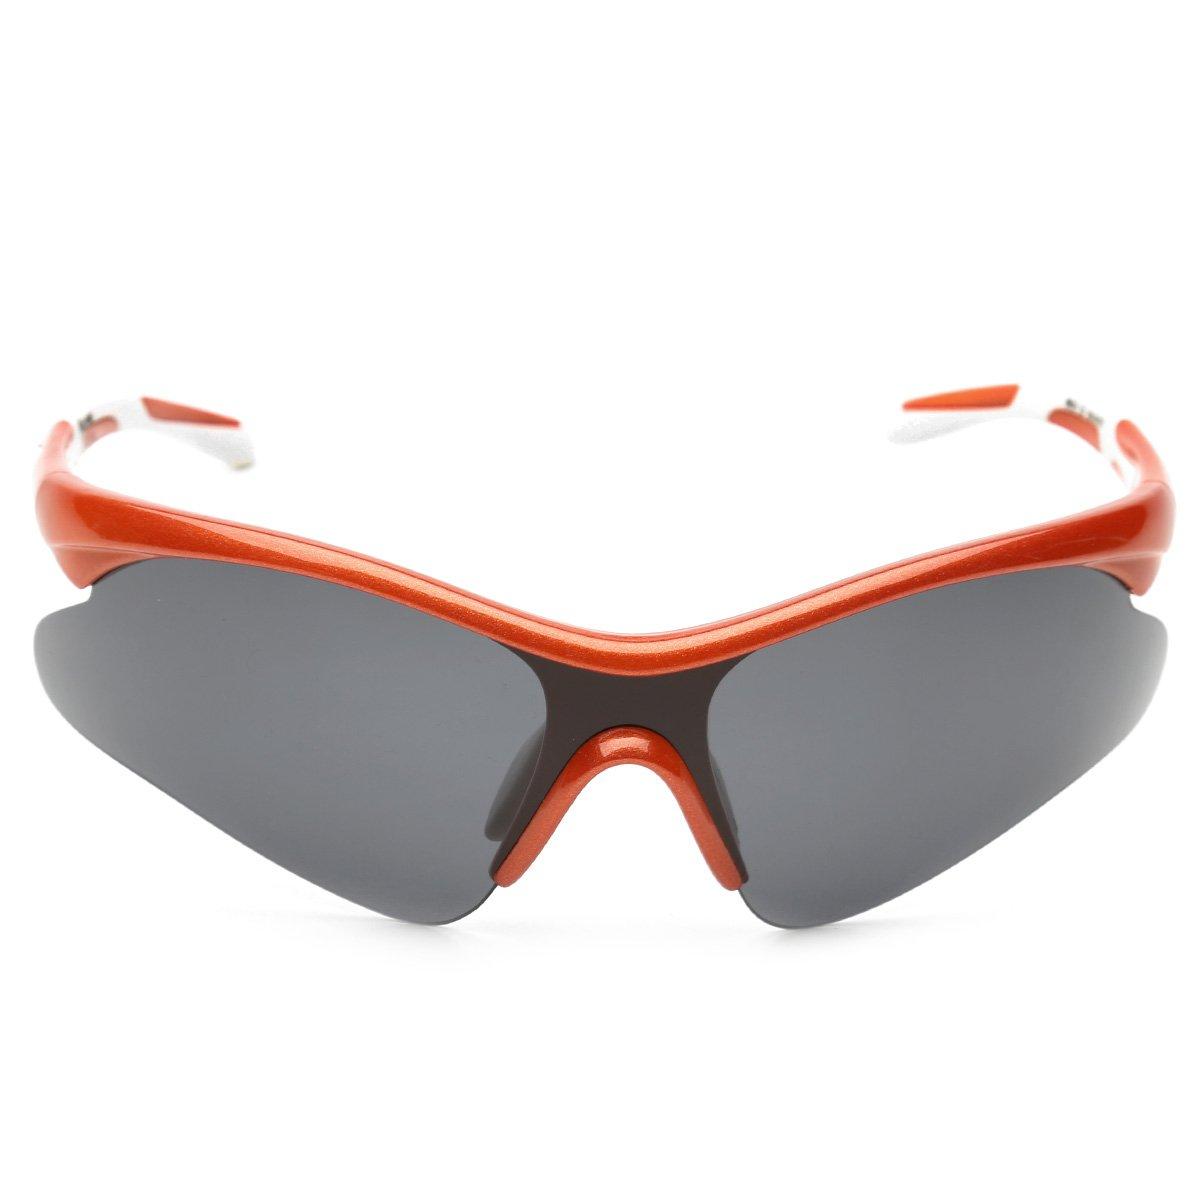 36f290837fdbd Óculos GONEW Advance - Polarizado  Óculos GONEW Advance - Polarizado ...